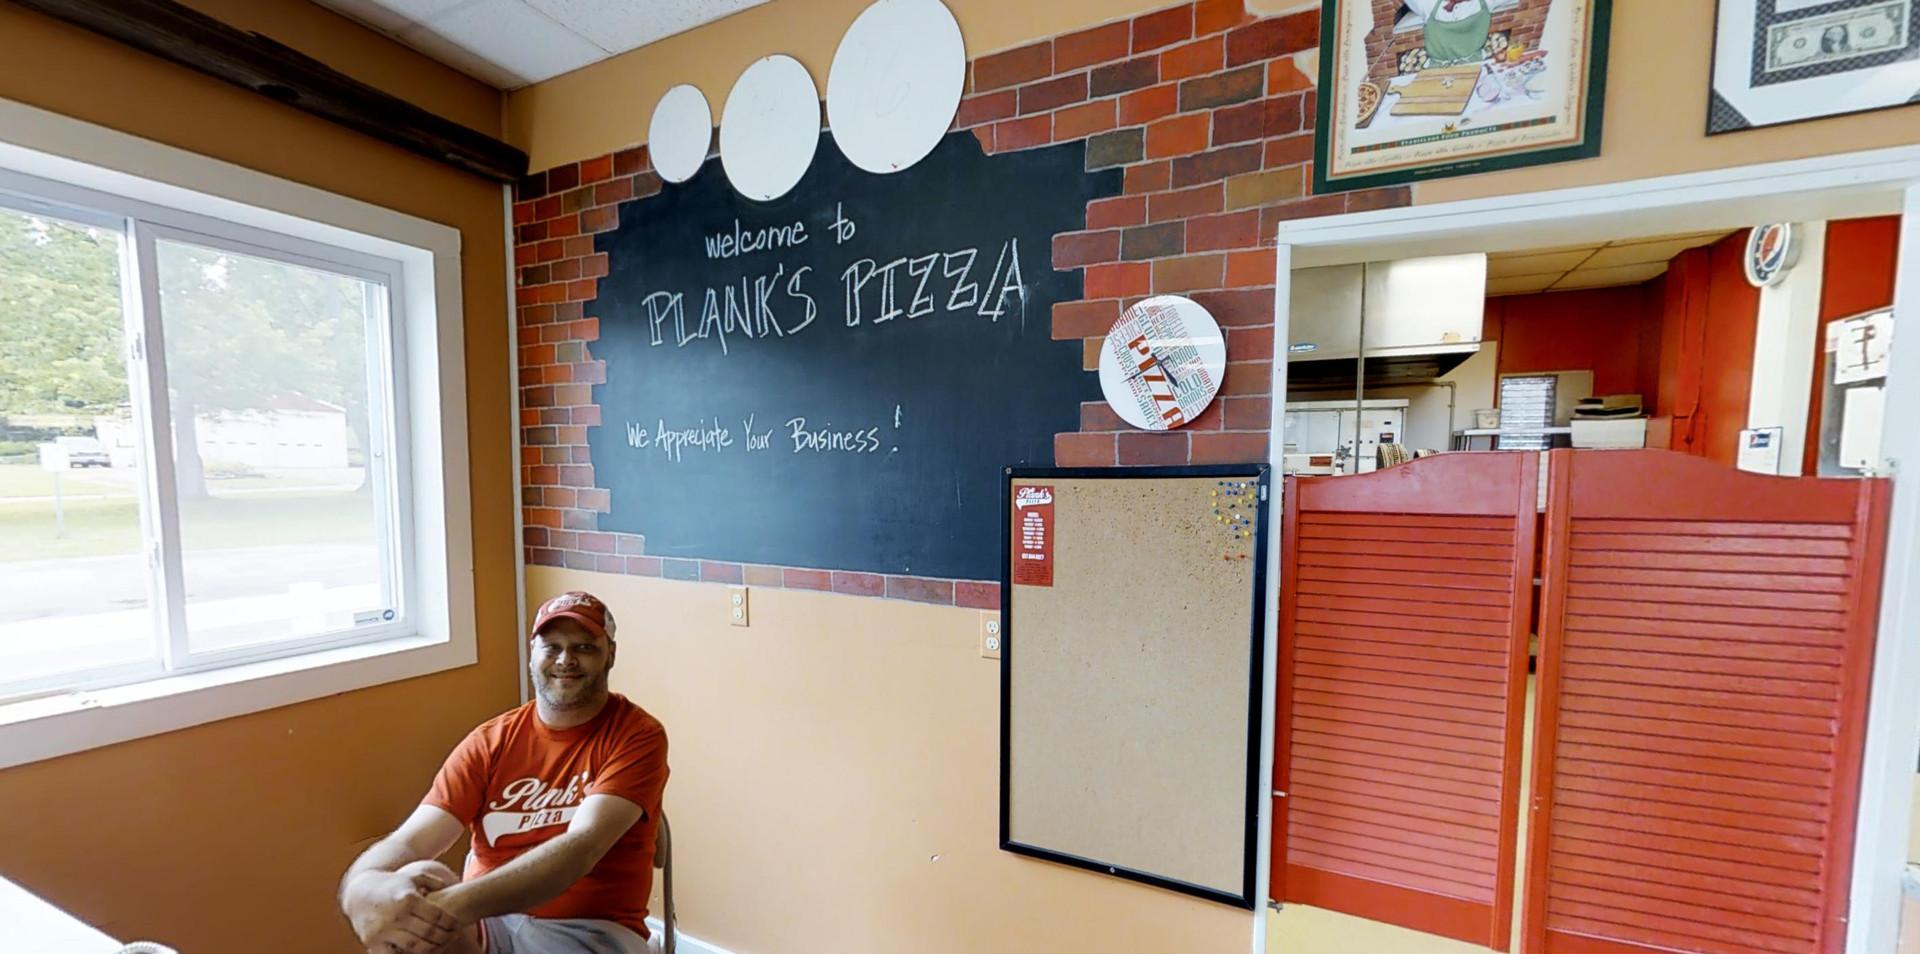 Planks Pizza